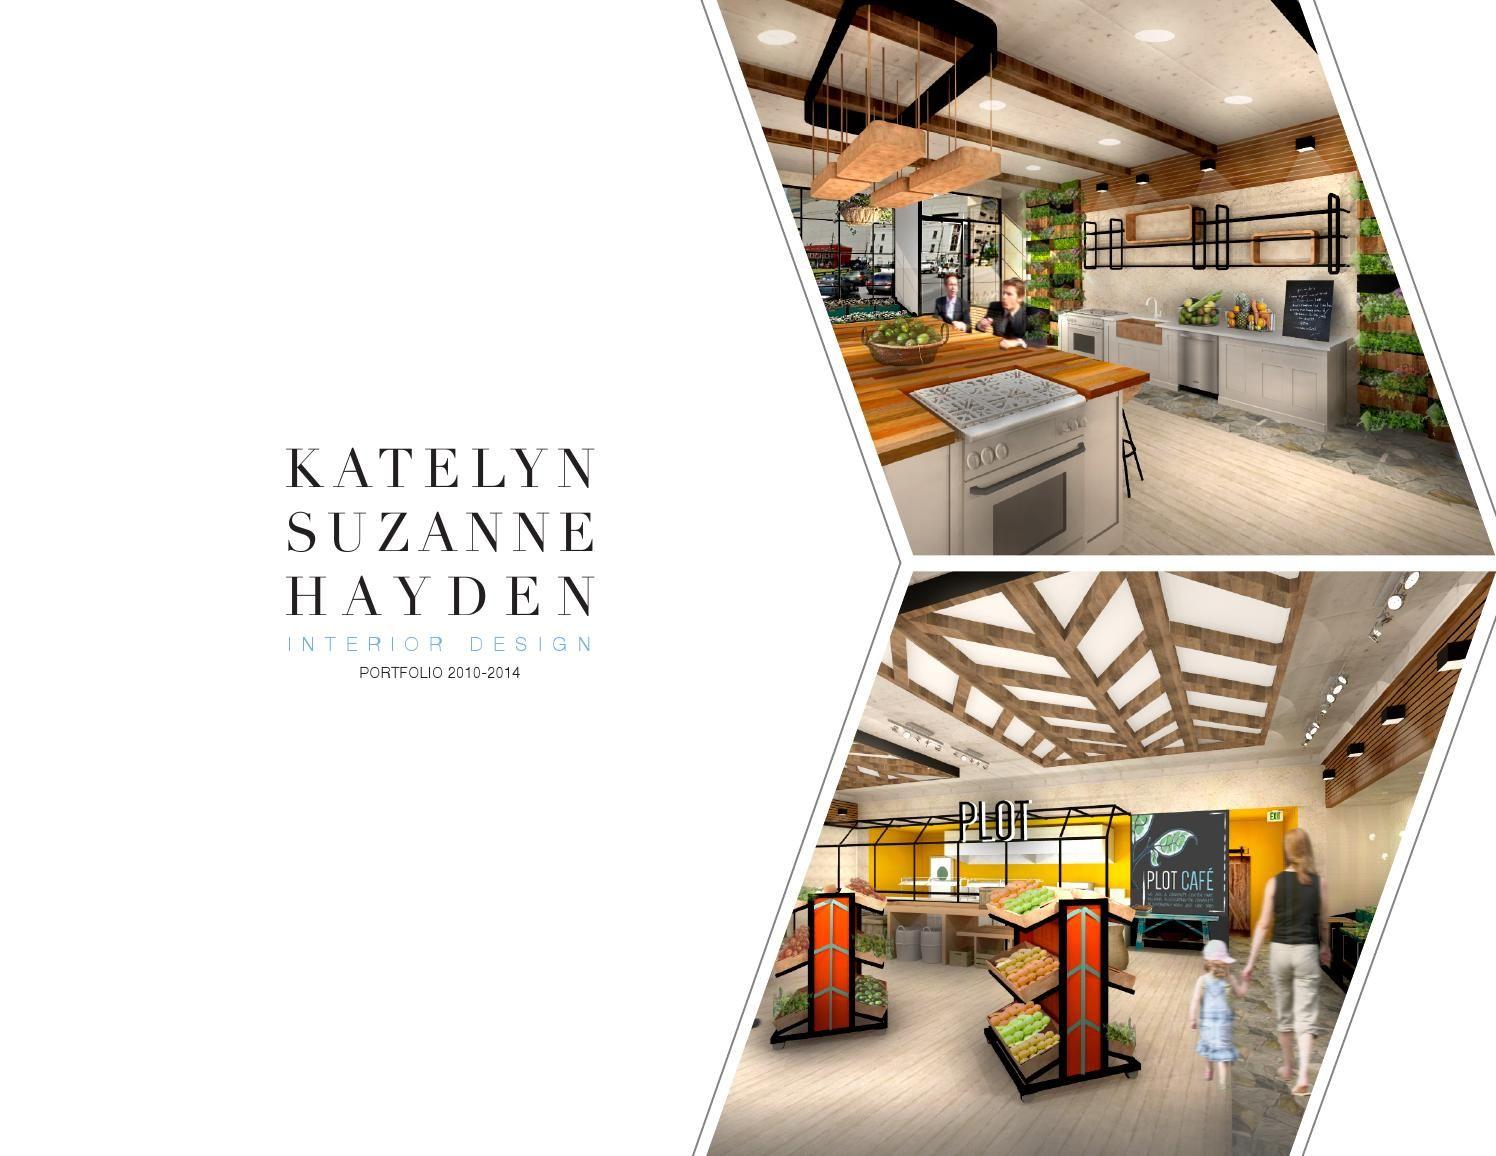 Interior Design_ Portfolio Interior design portfolios